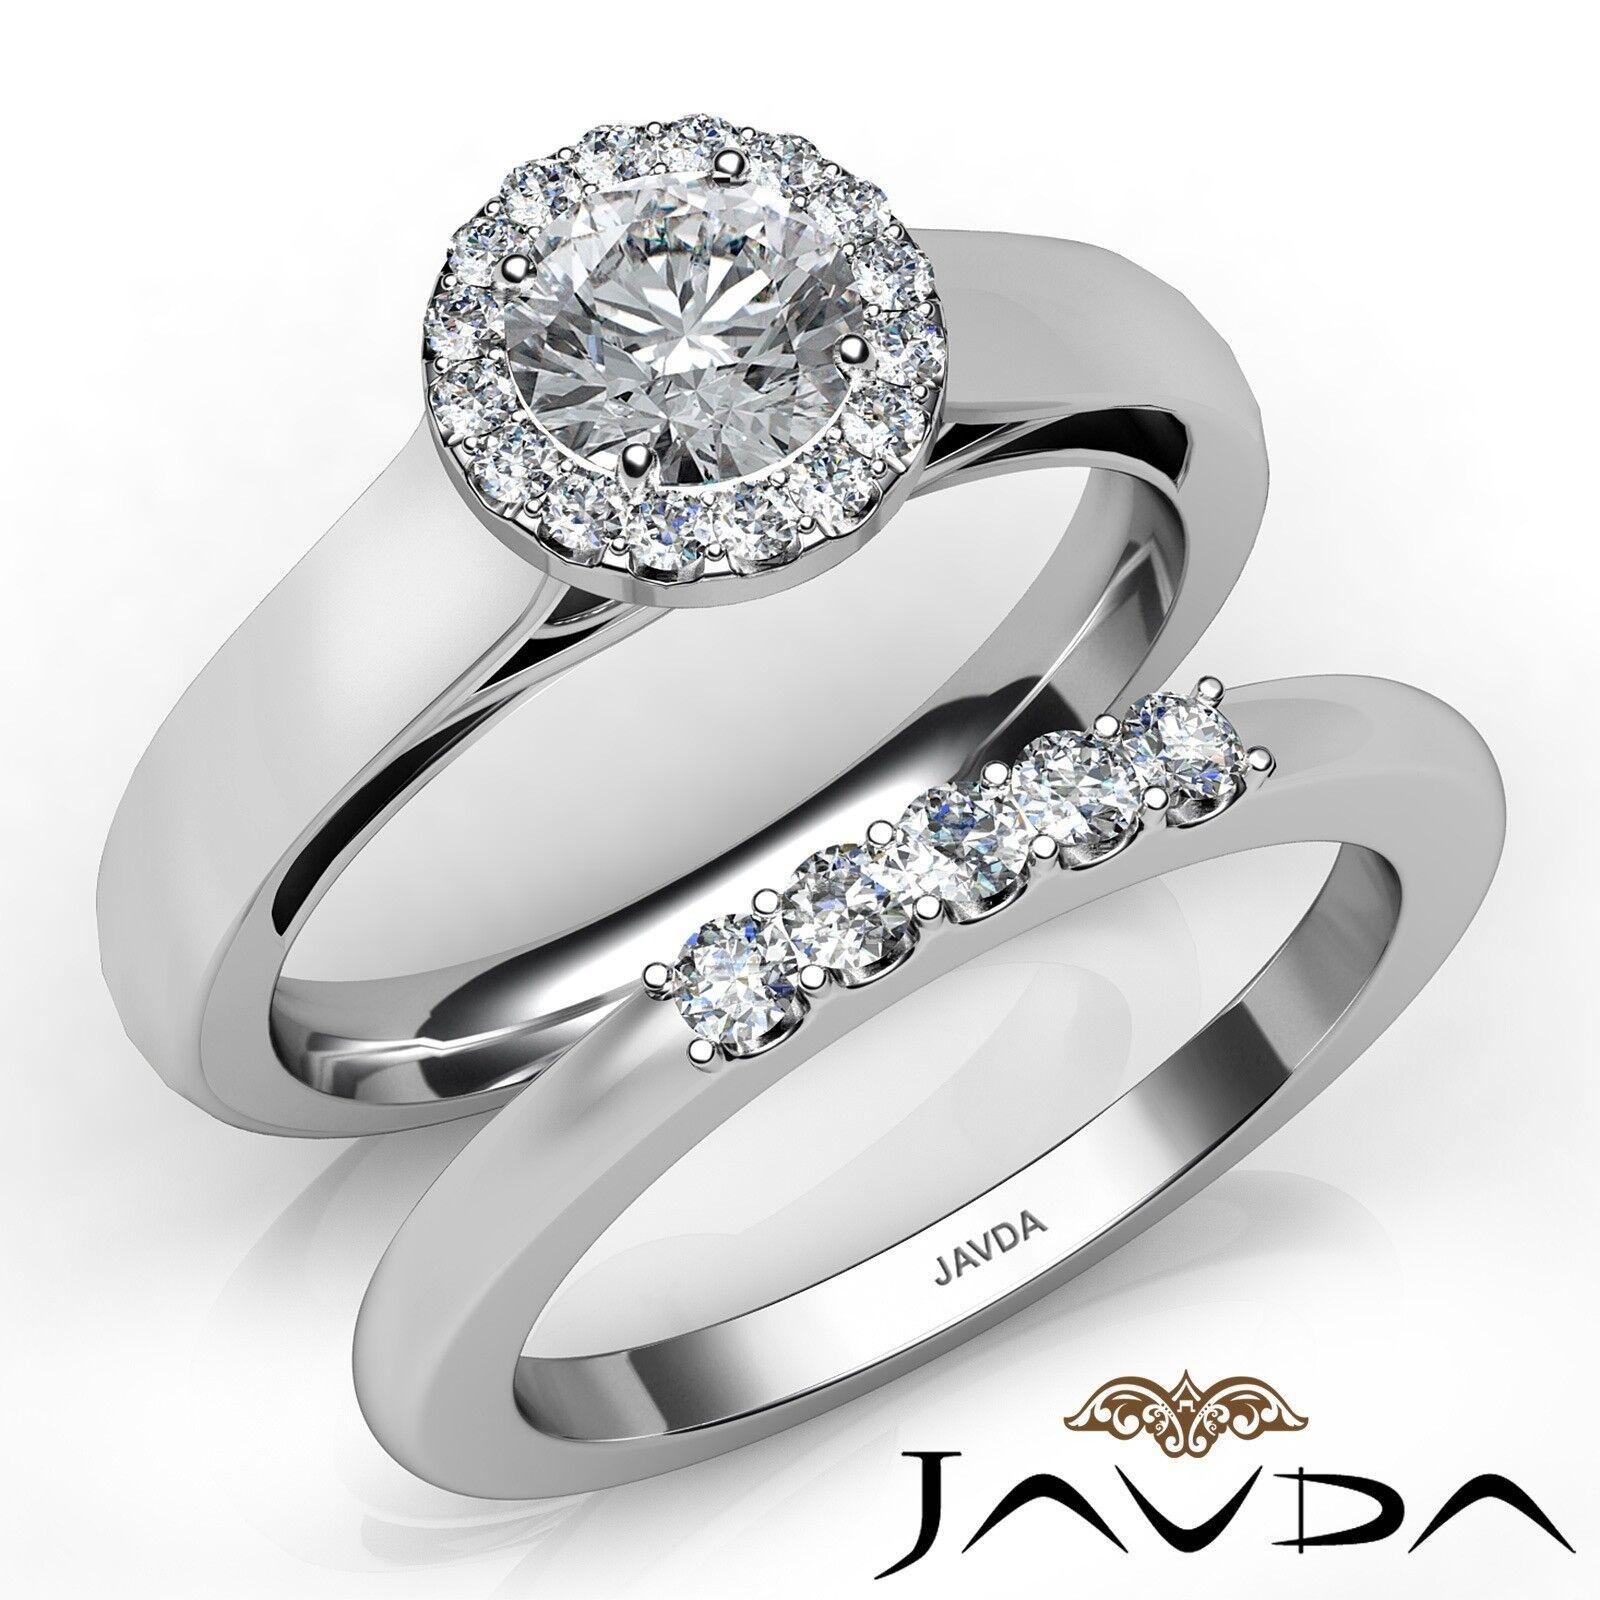 0.8ctw U Prong Halo Bridal Round Diamond Engagement Ring GIA F-VVS1 White Gold